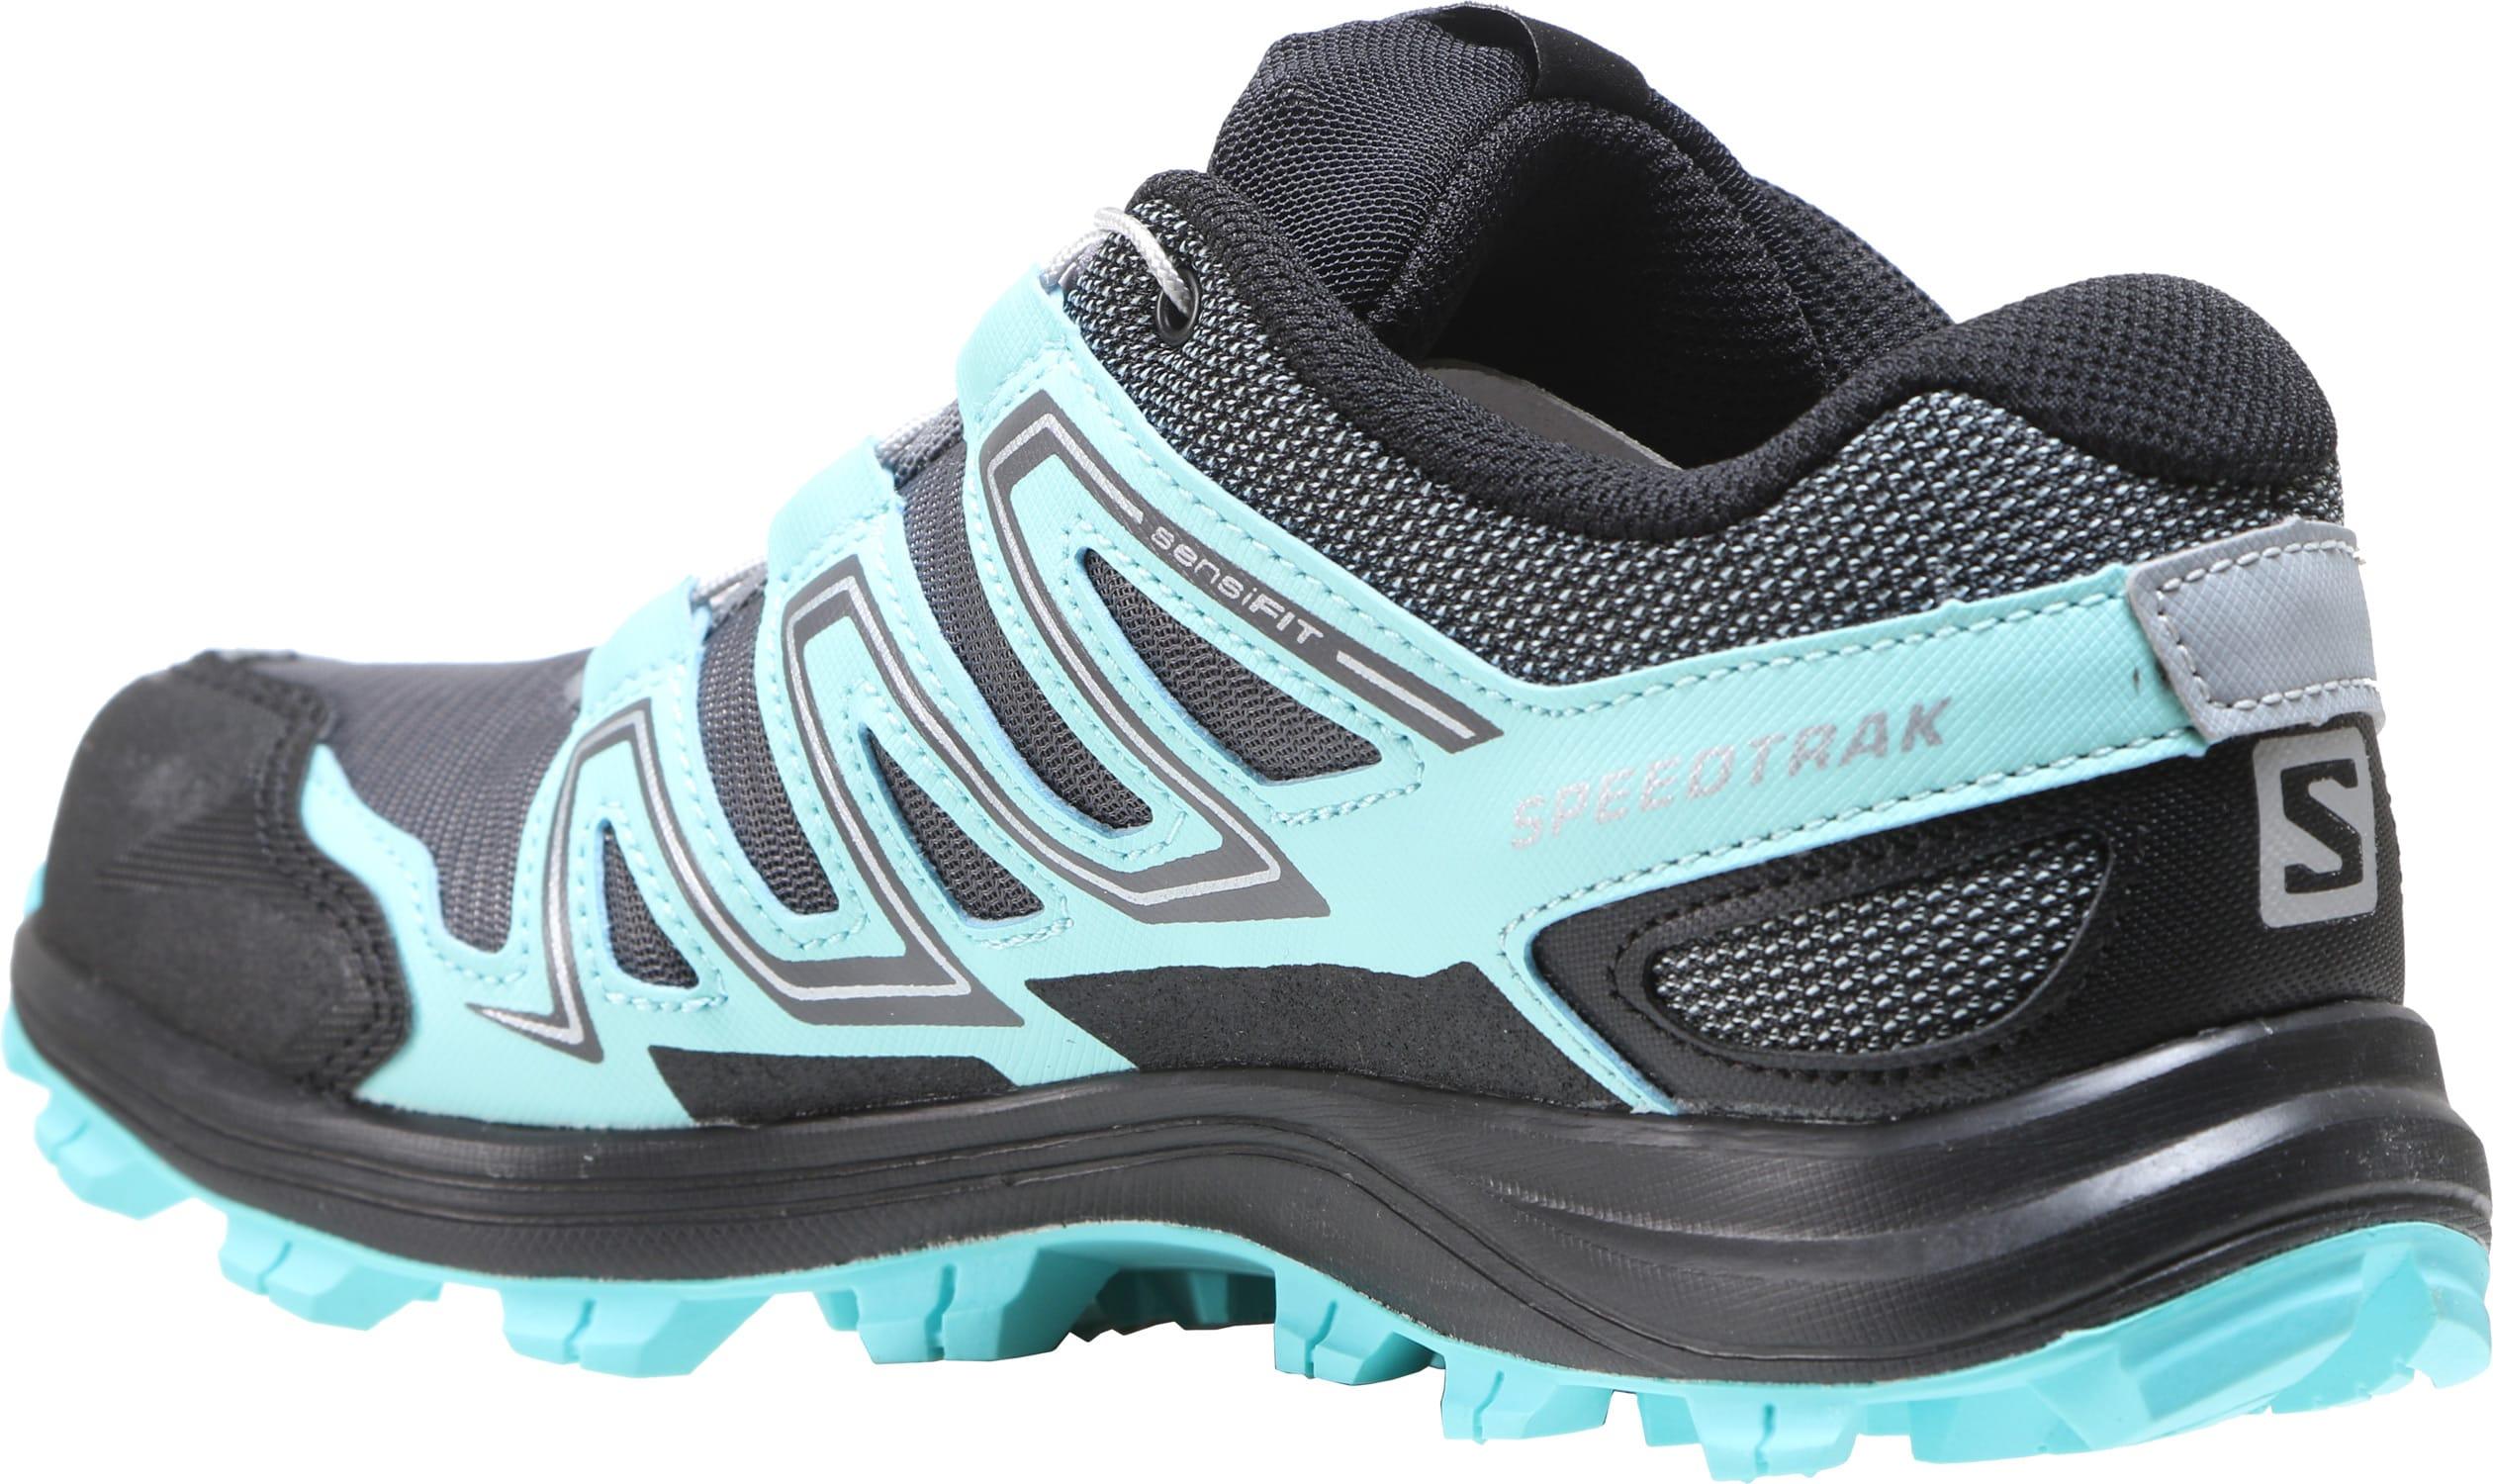 b47a2d2f3962 Salomon Speedtrak Trail Running Shoes - thumbnail 3